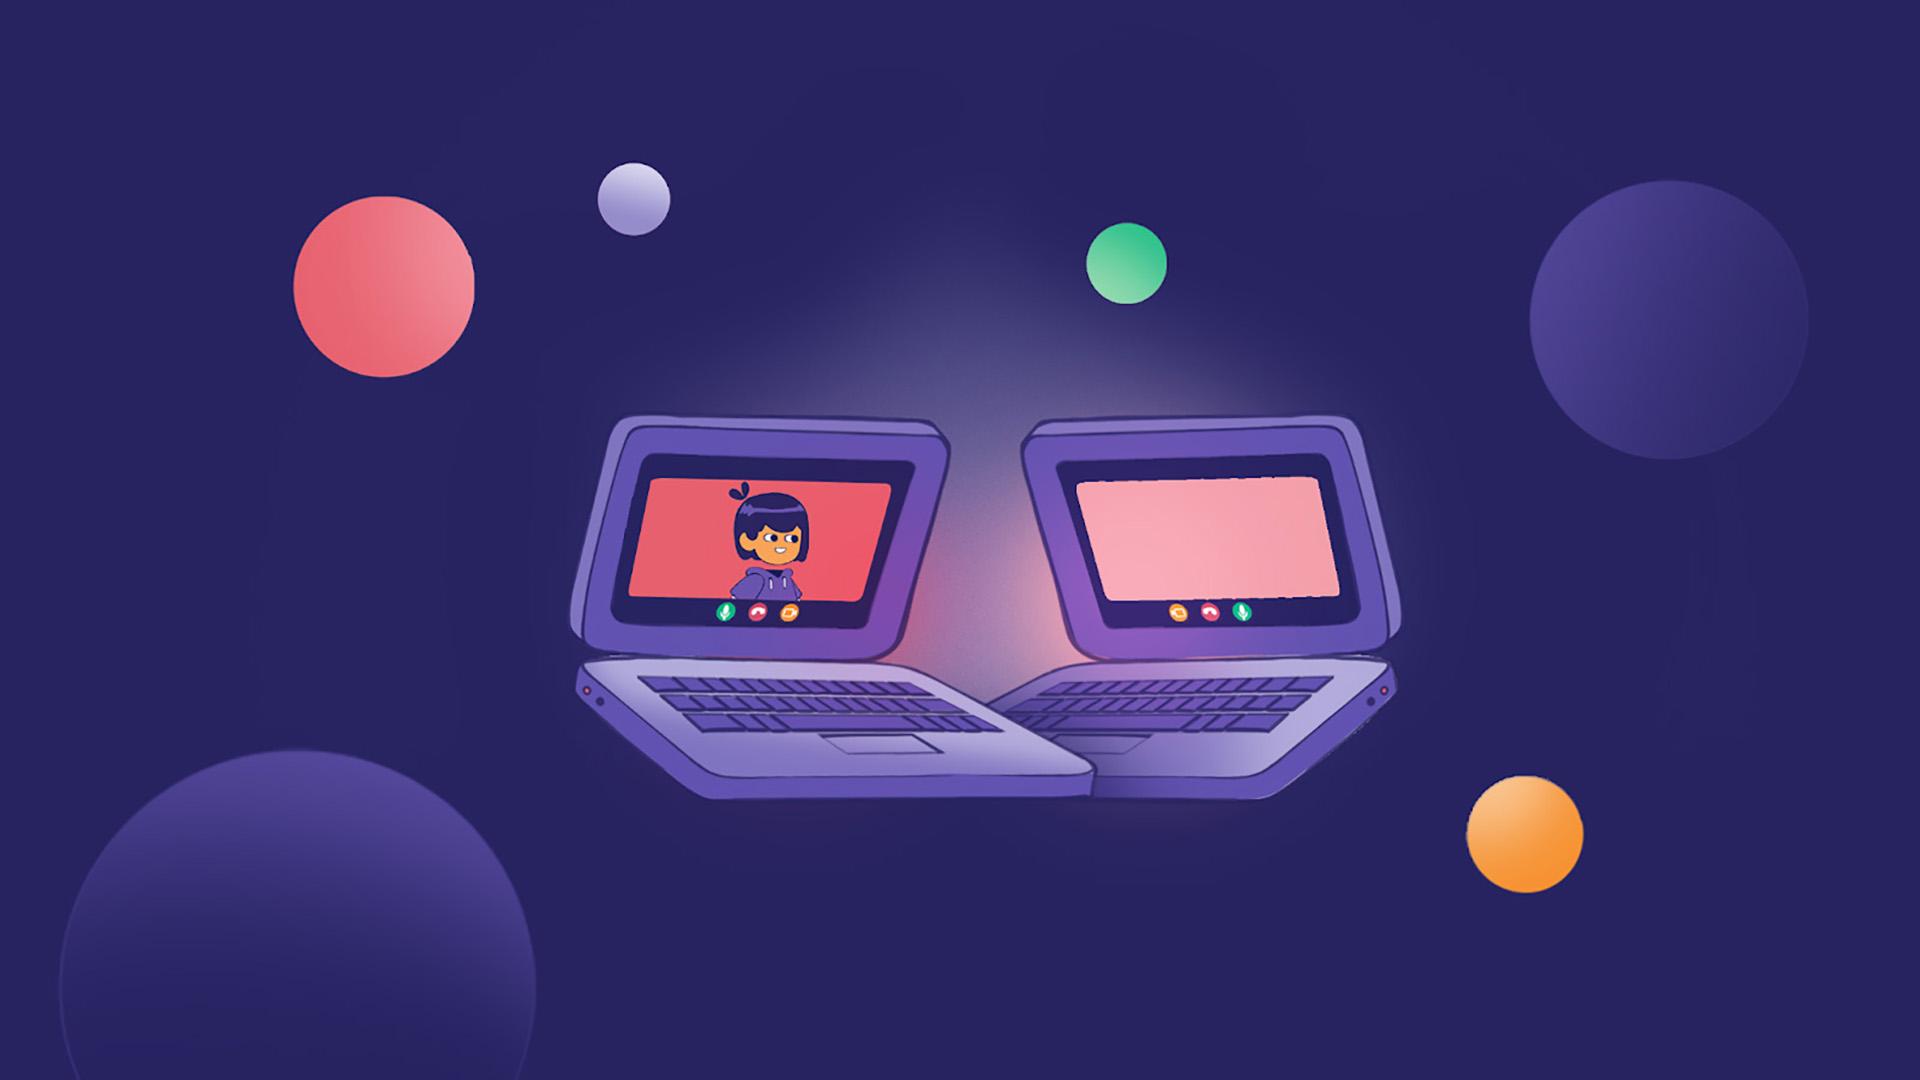 roofstudio_juni-learning_laptop-02-2